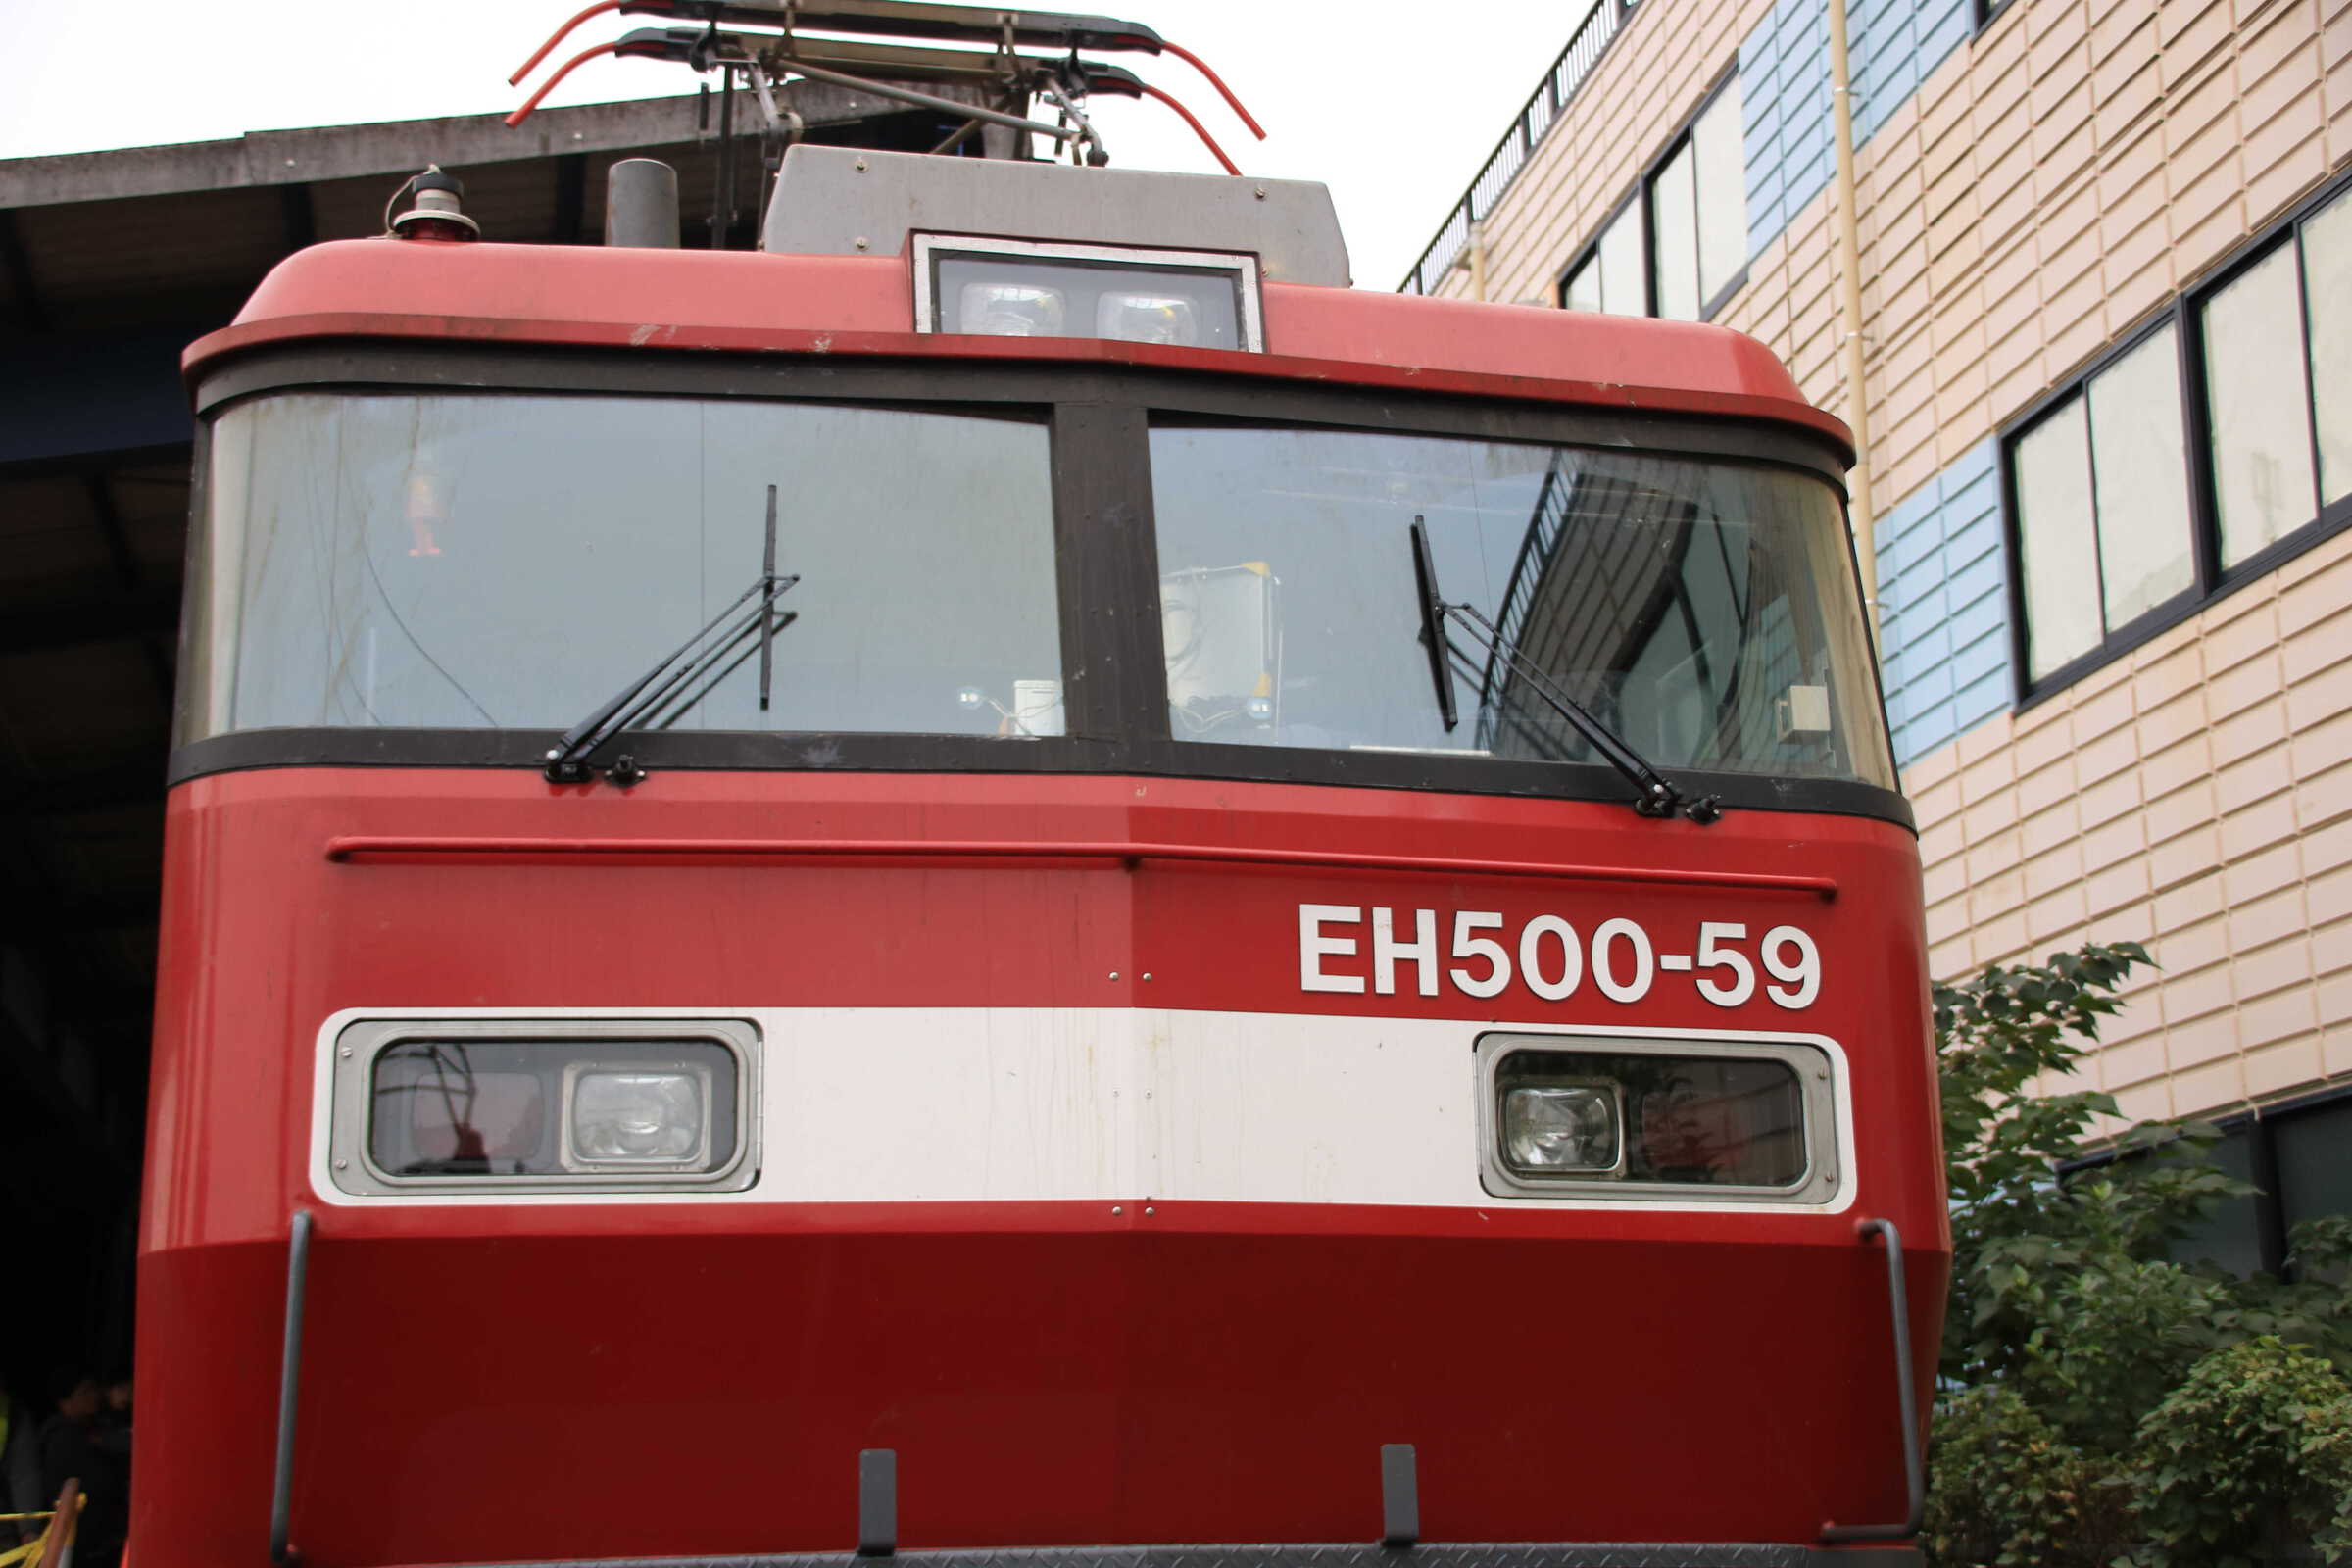 EH500-59